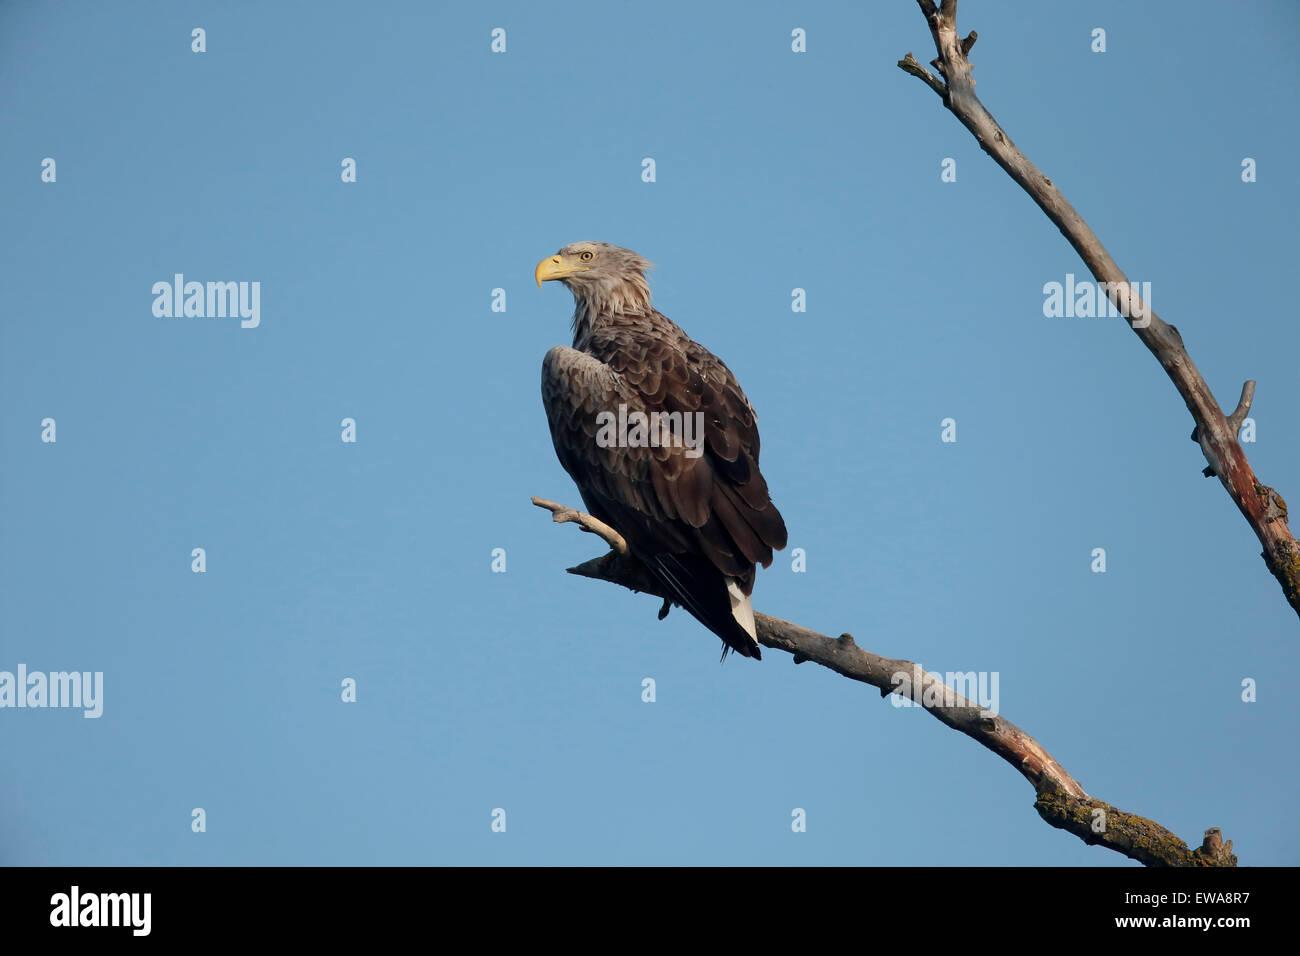 White-tailed sea-eagle, Haliaeetus albicilla, single bird on branch, Romania, May 2015 Stock Photo